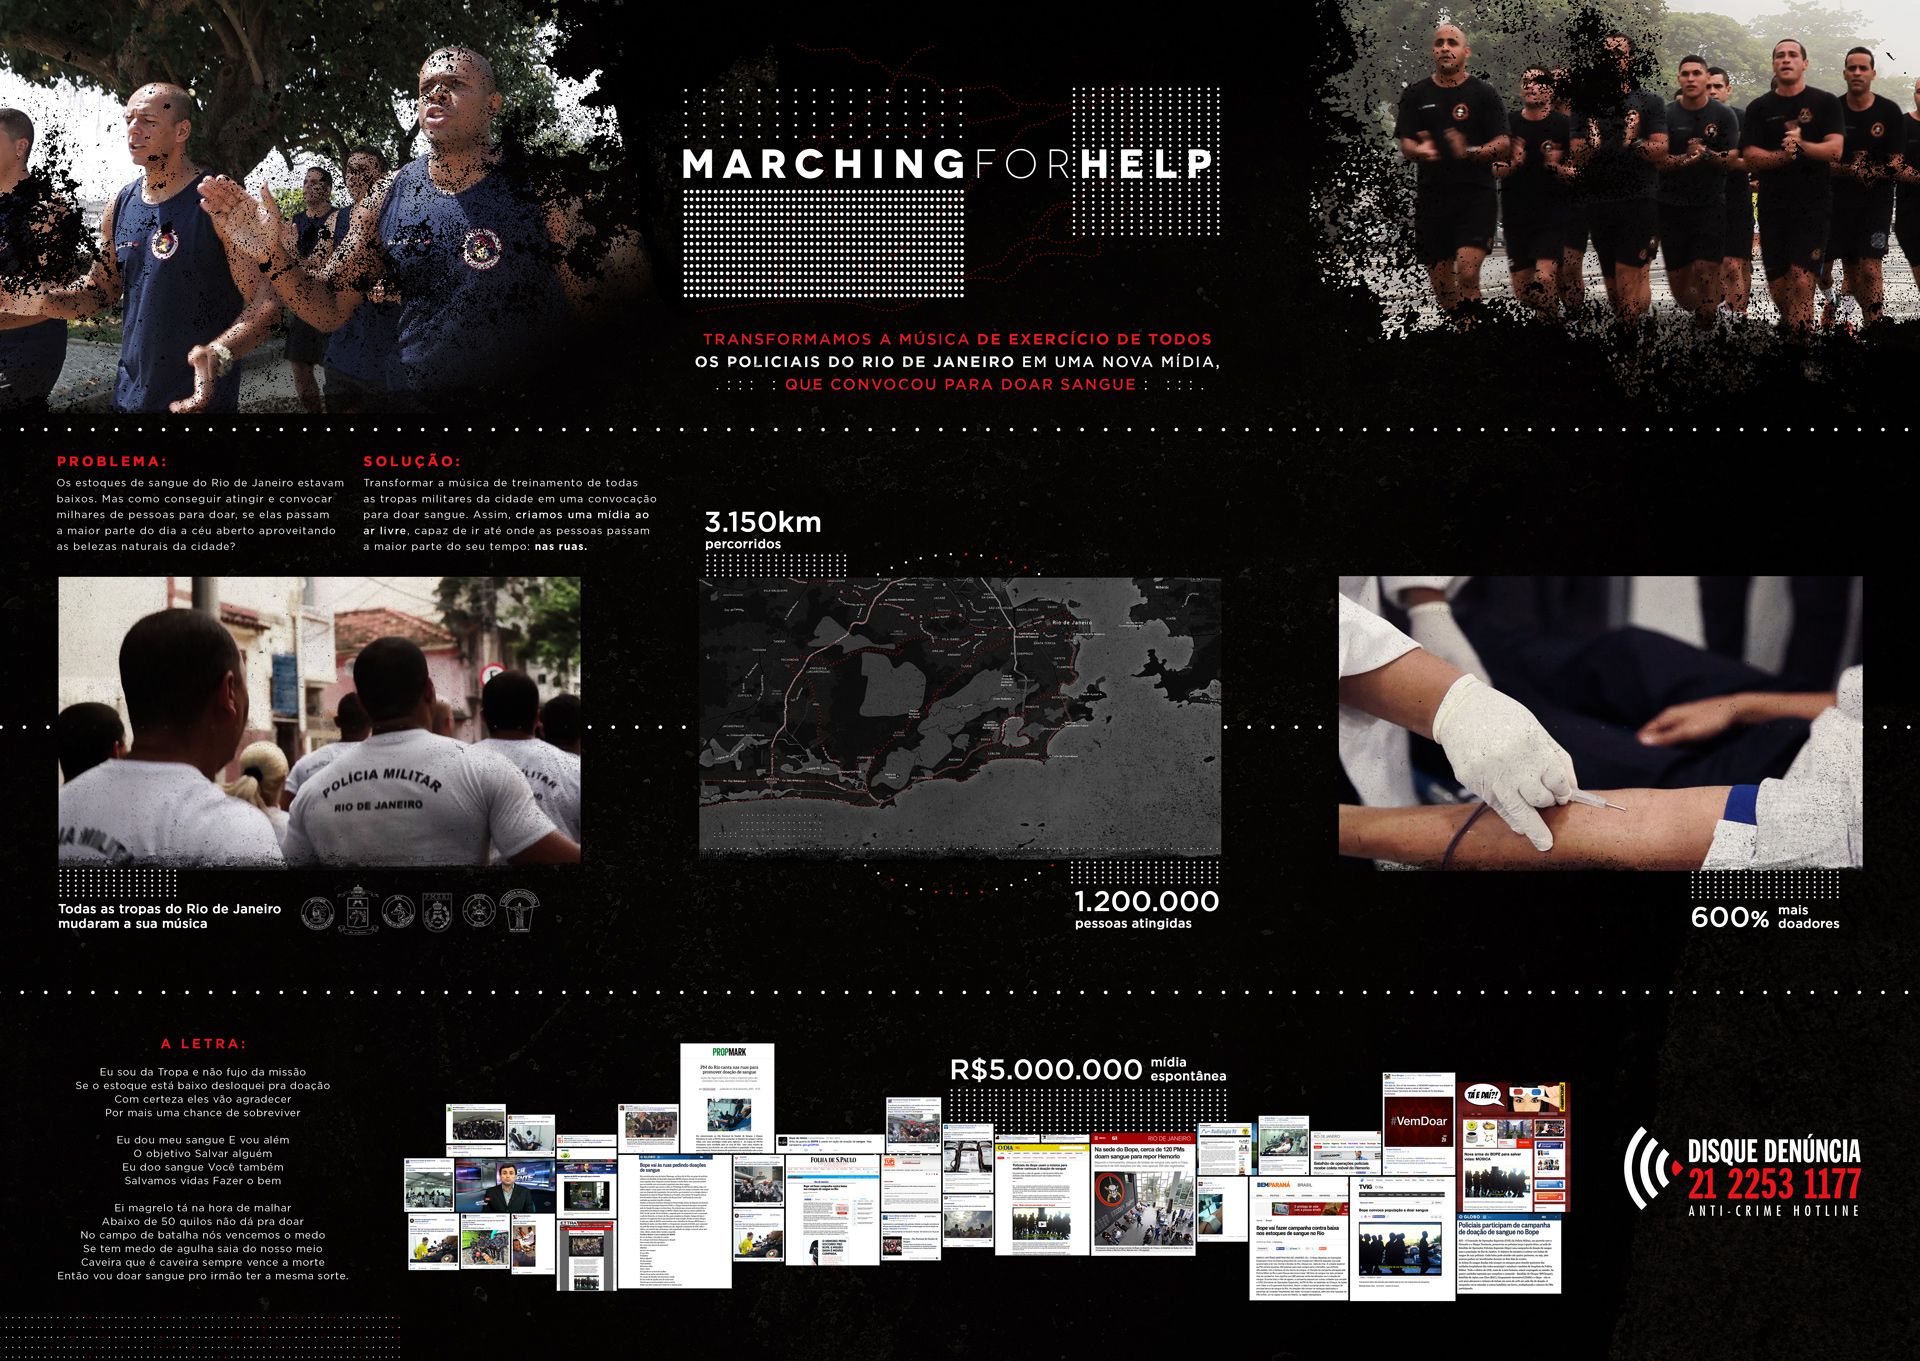 marchingforhelp_pt